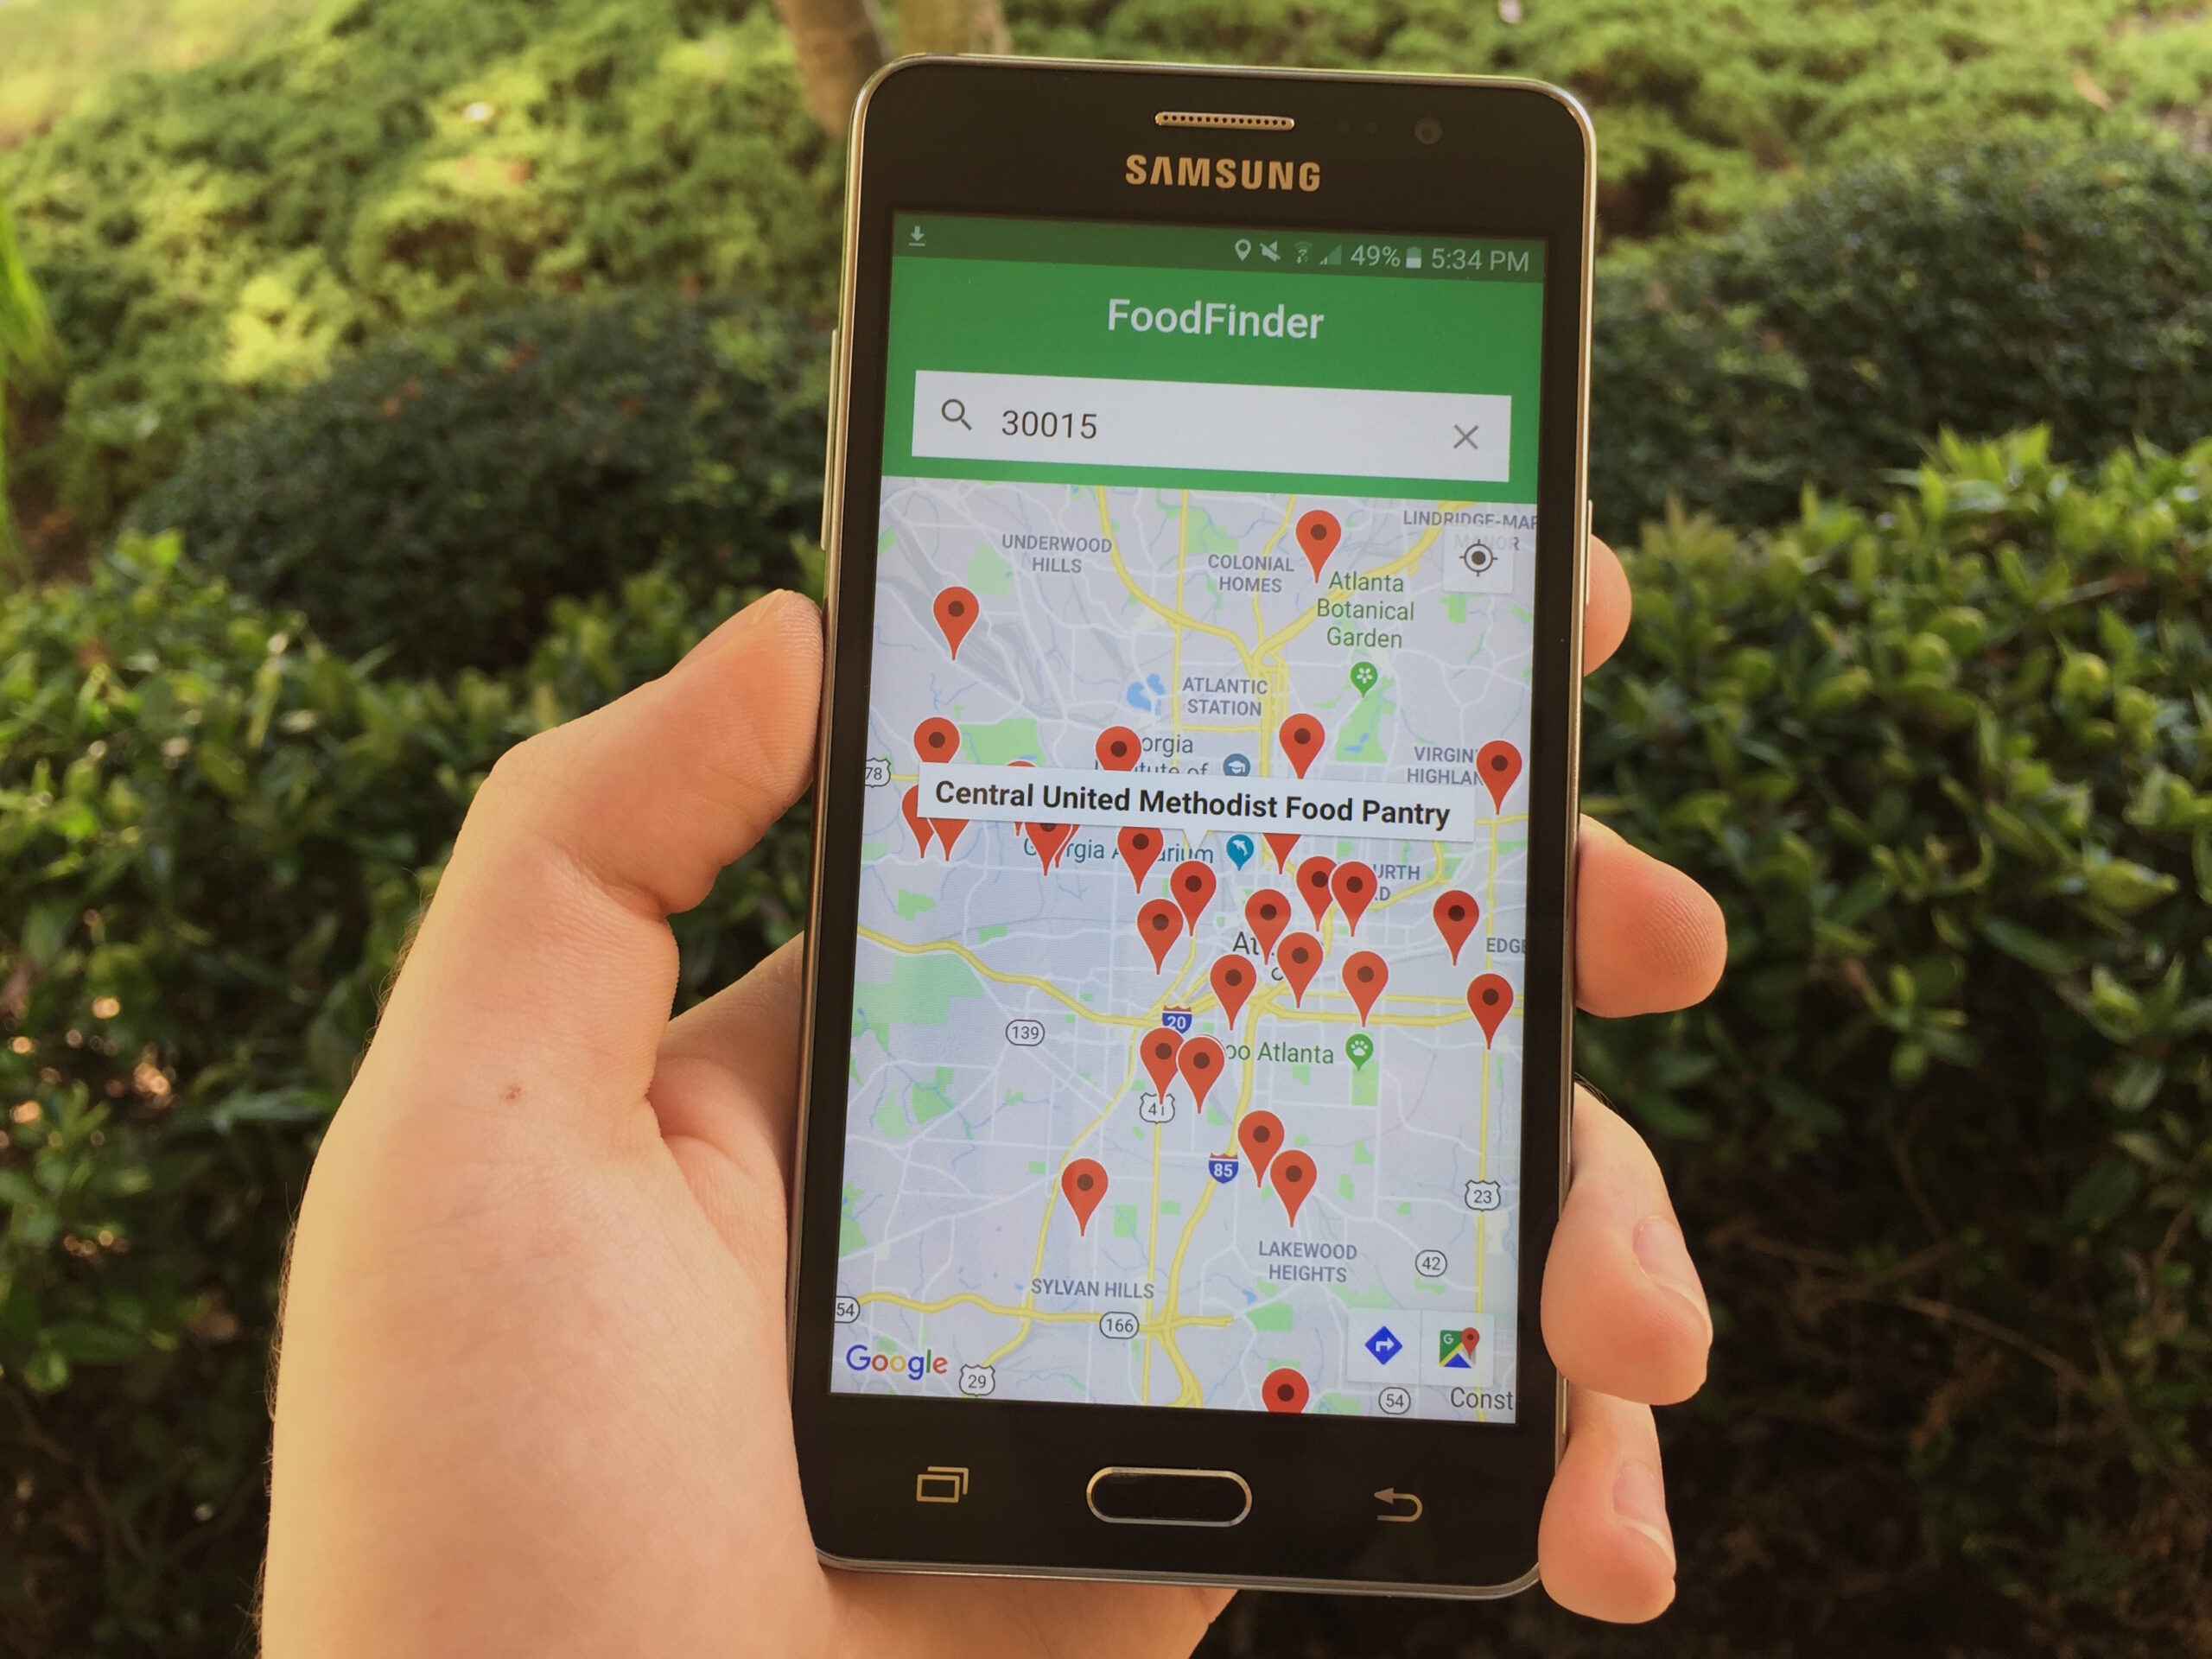 The FoodFinder app.